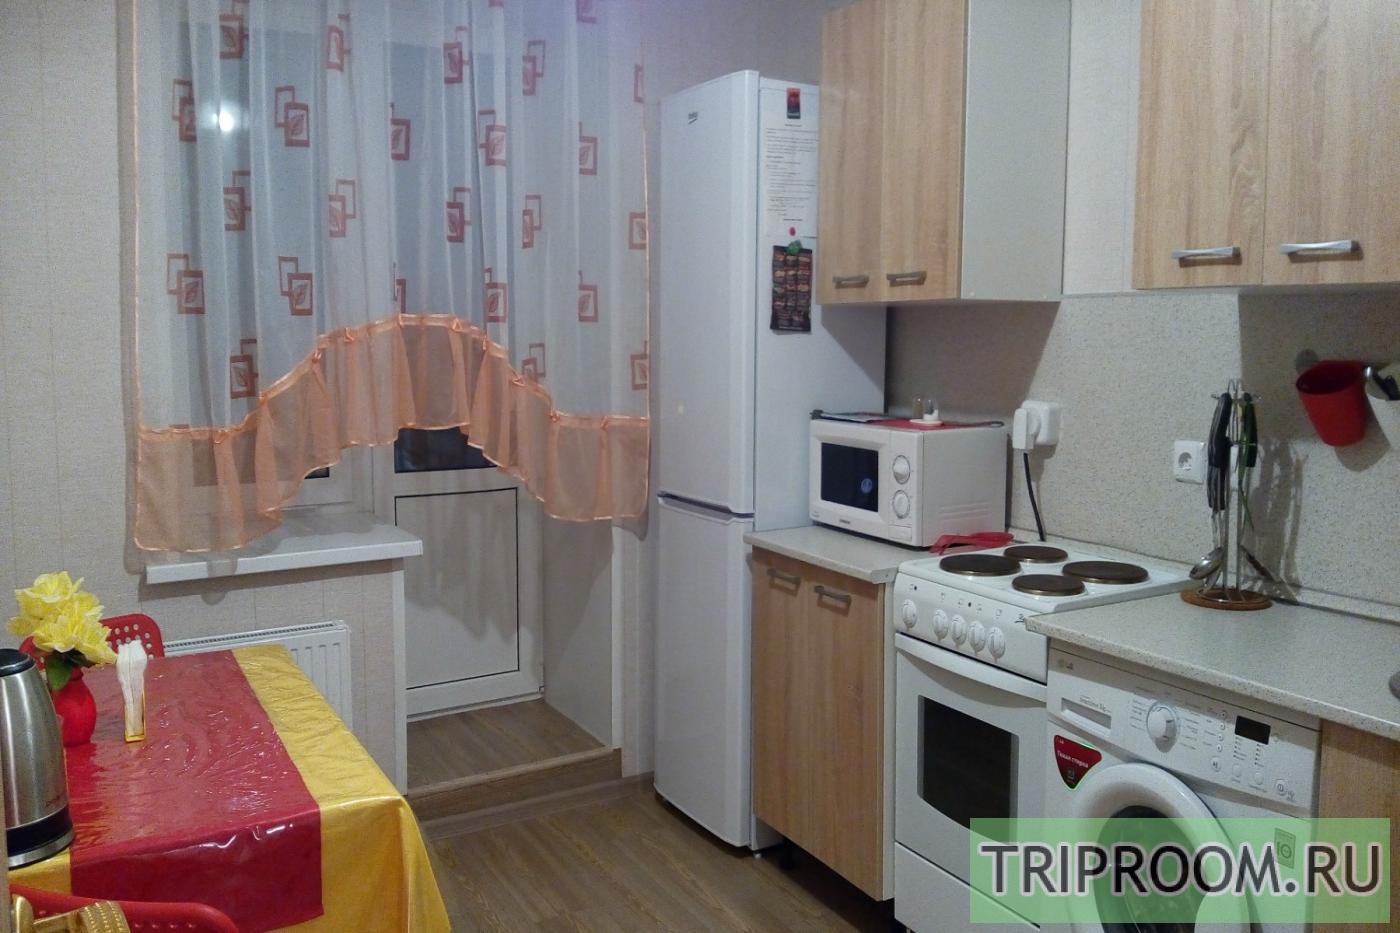 1-комнатная квартира посуточно (вариант № 11254), ул. Рауиса Гареева улица, фото № 4